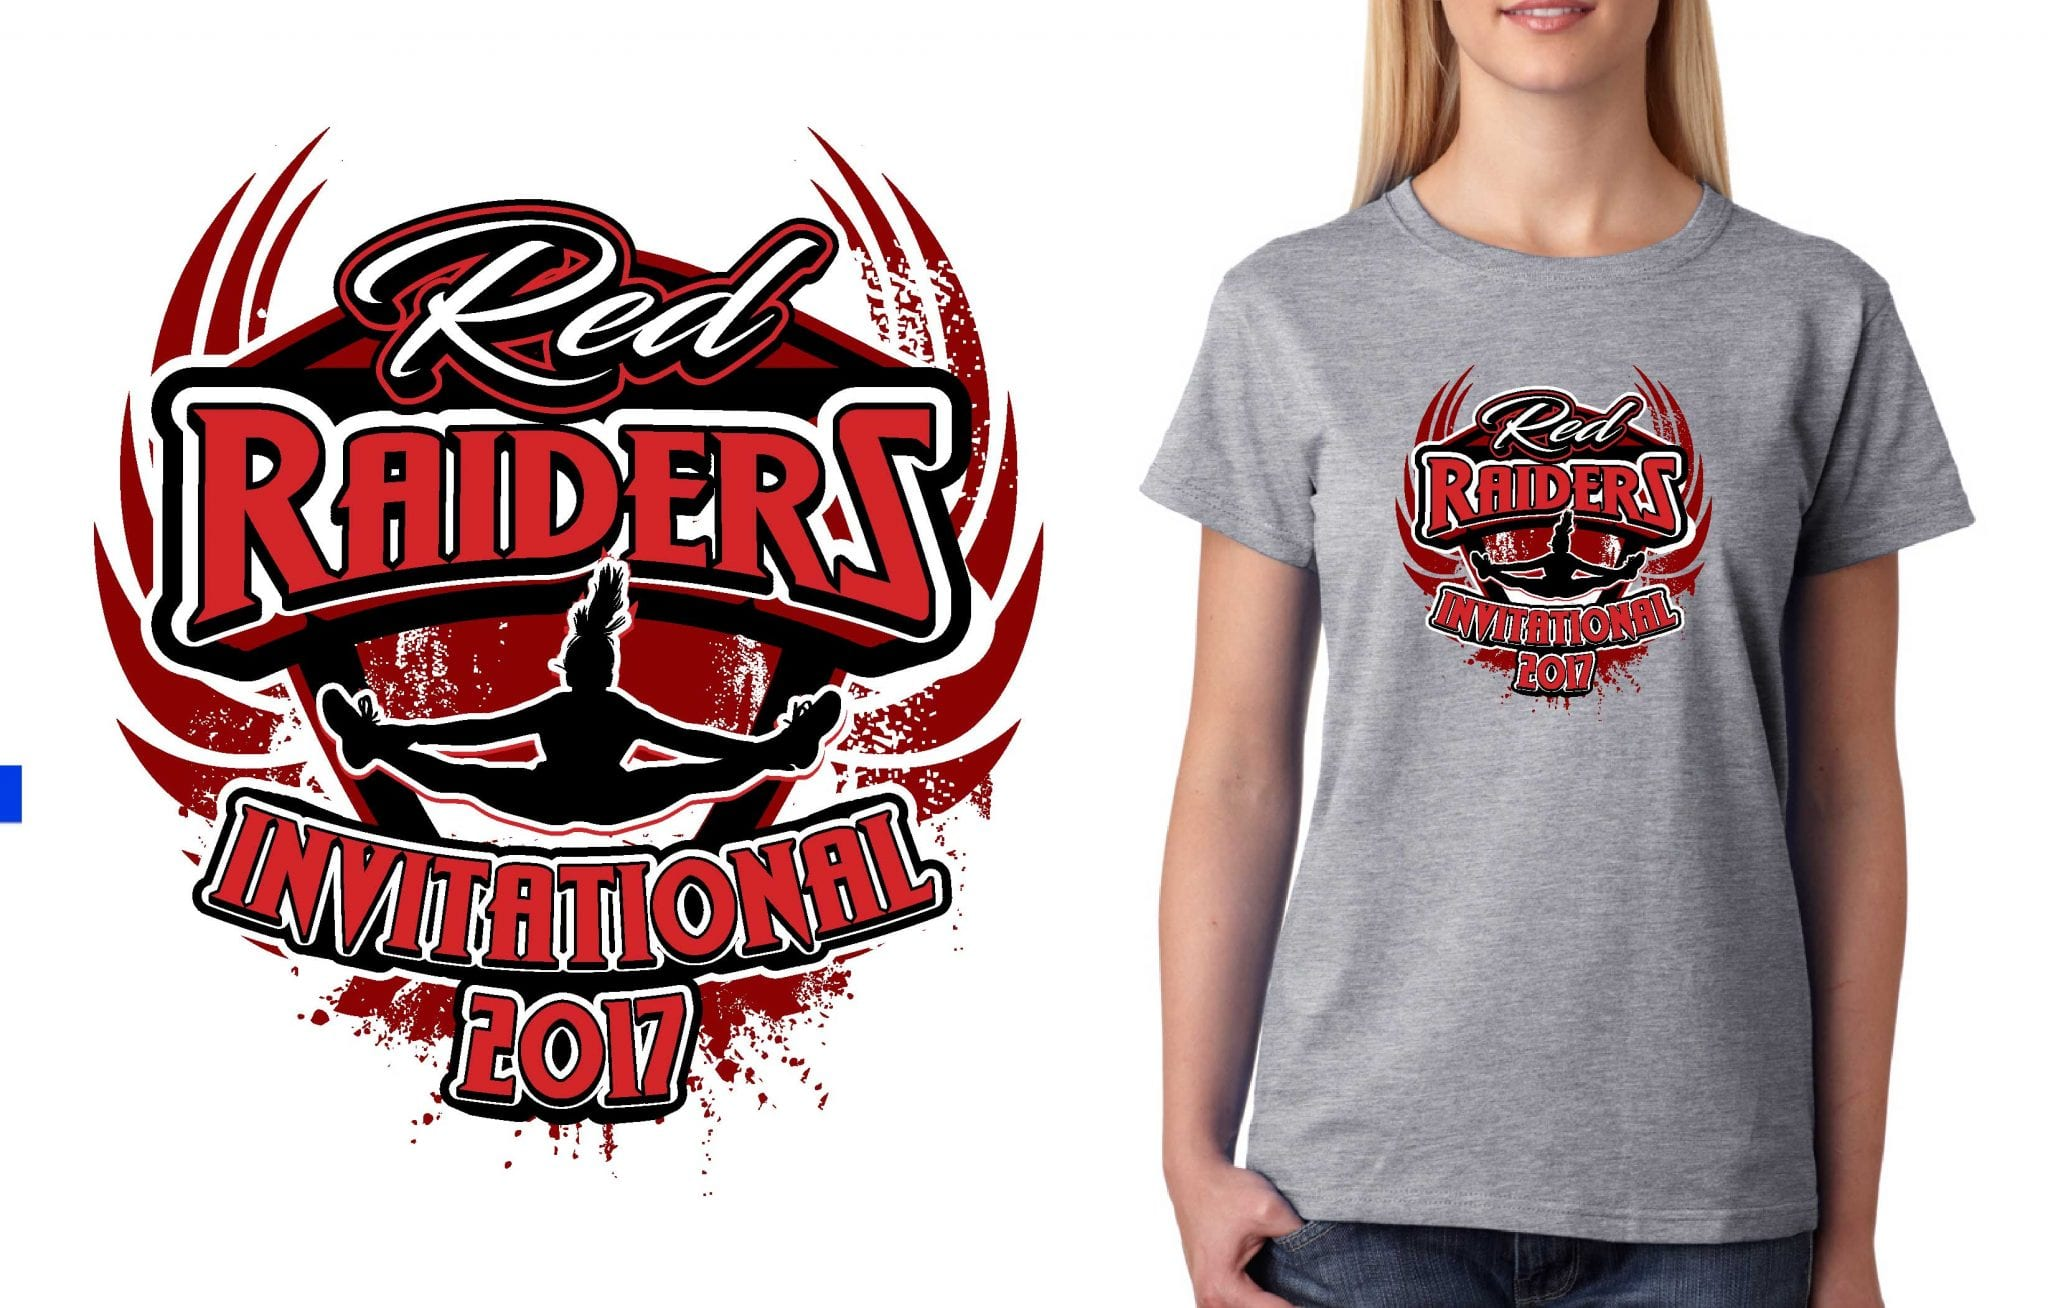 2017 Red Raider Invitational Patti vector logo design for cheer t-shirt UrArtStudio